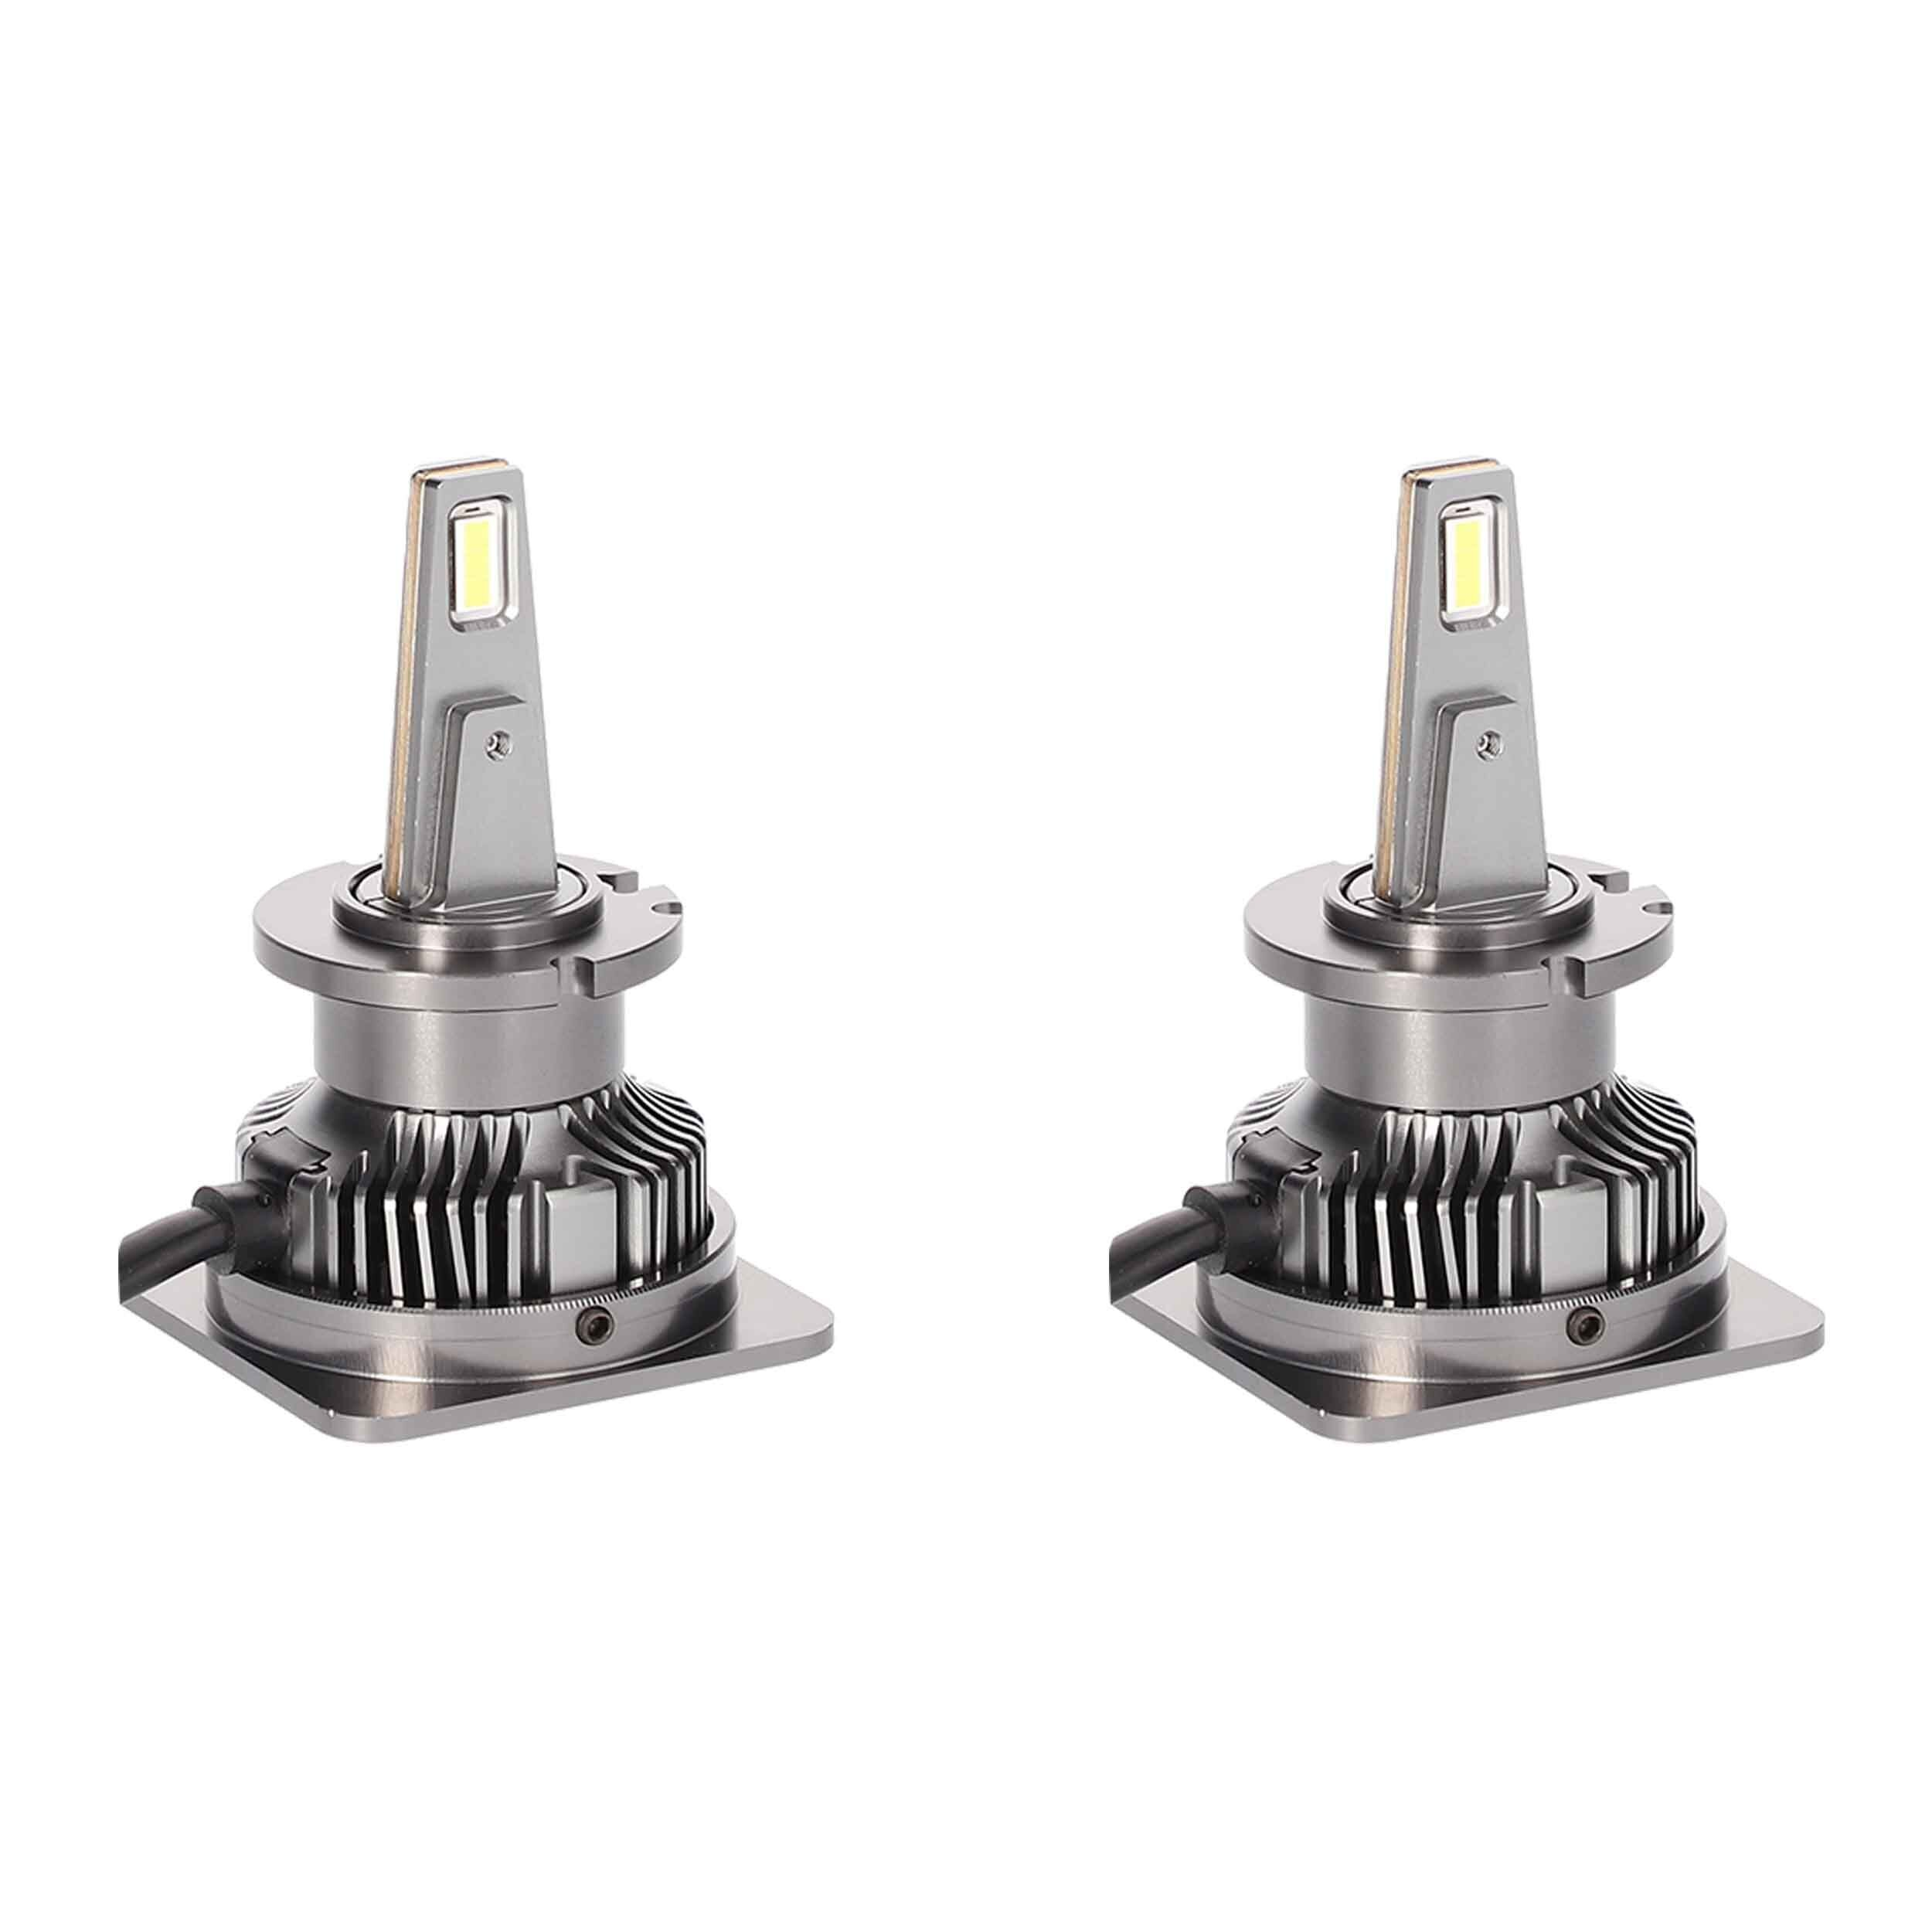 Pro Series LED Bulbs - Fits D4S, D4R